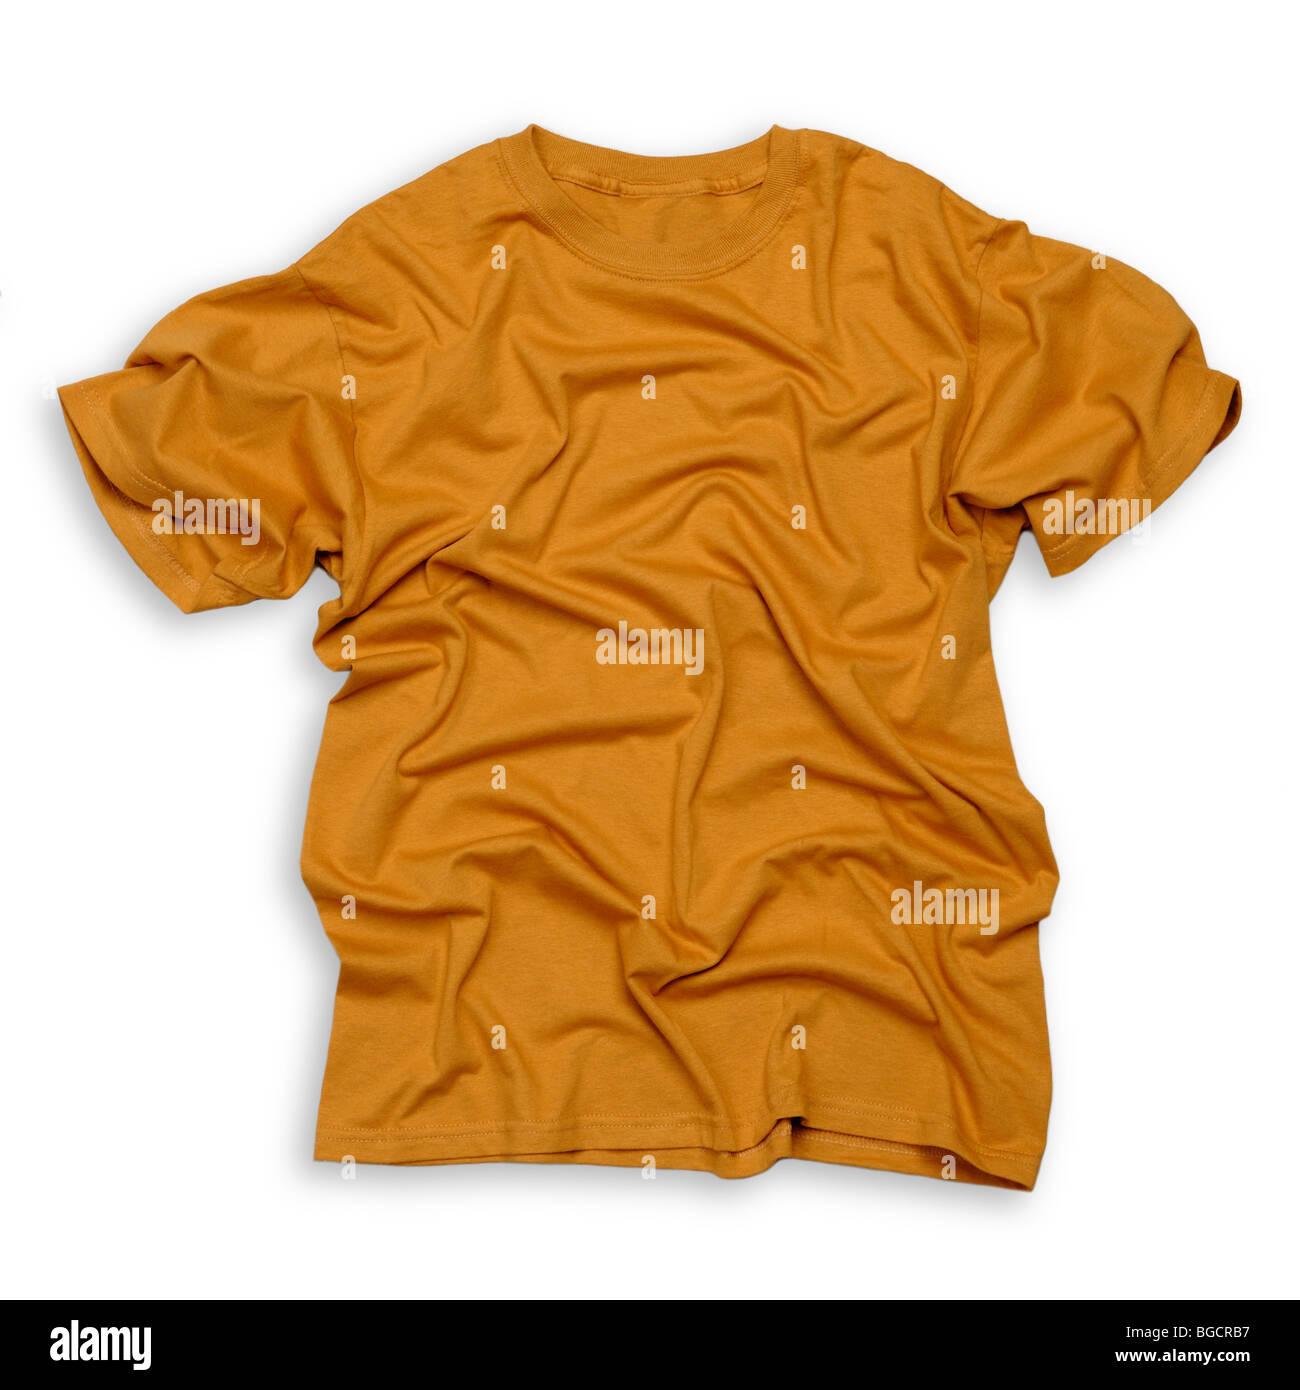 Orange tee shirt - Stock Image